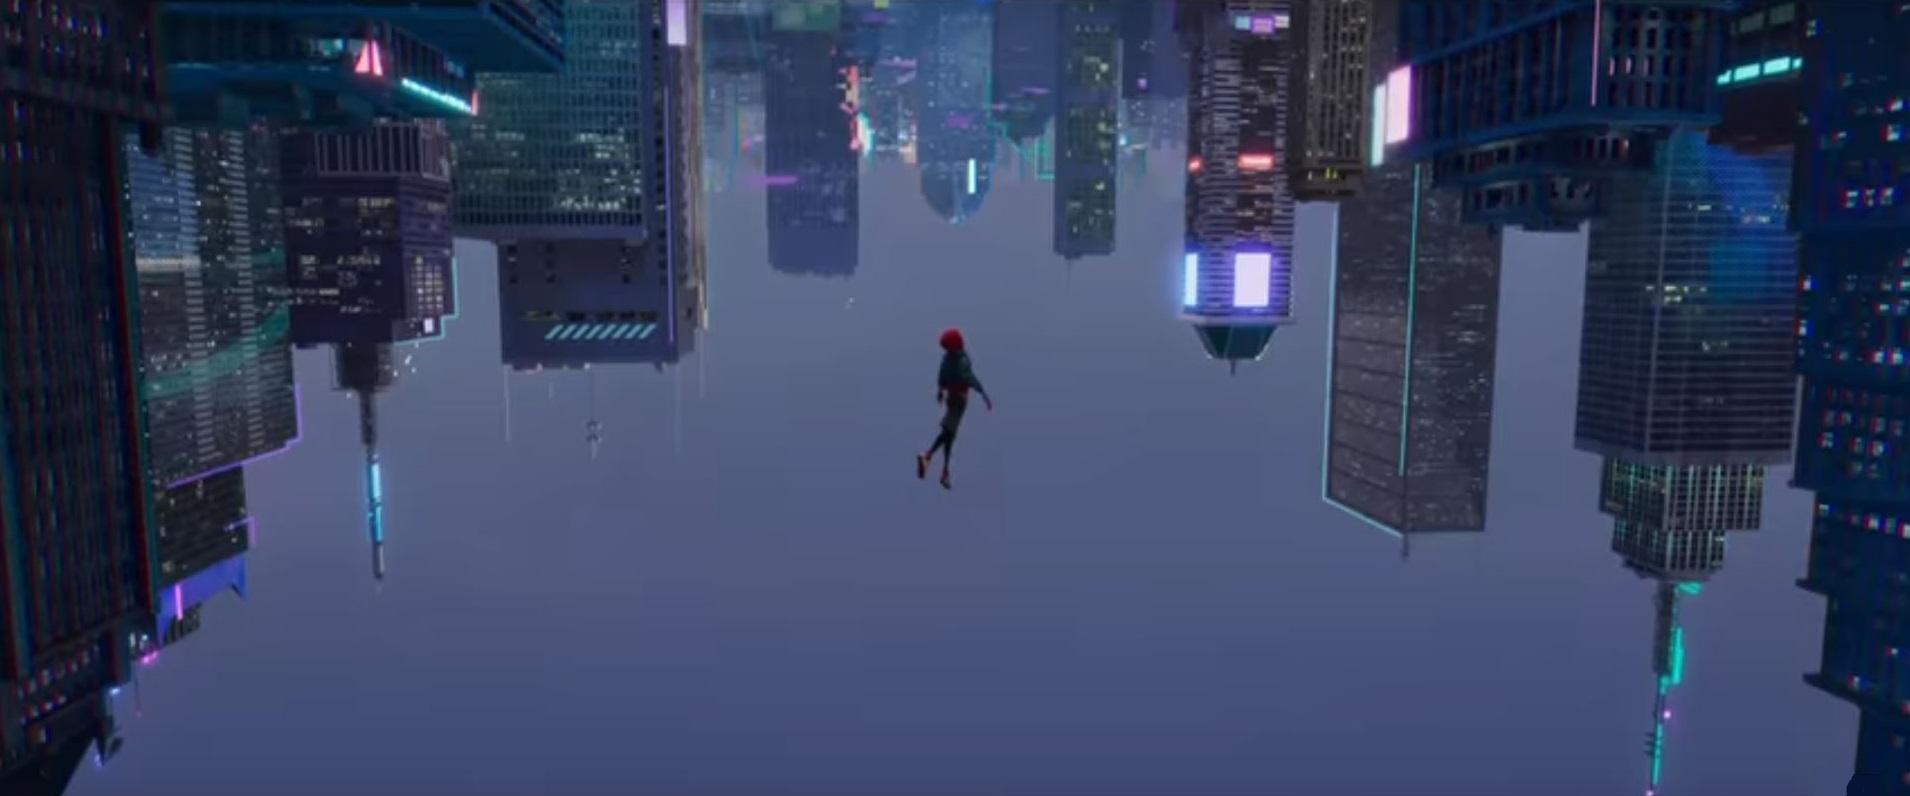 3d Xmas Tree Live Wallpaper Spider Man Into The Spiderverse Wallpaper I Threw